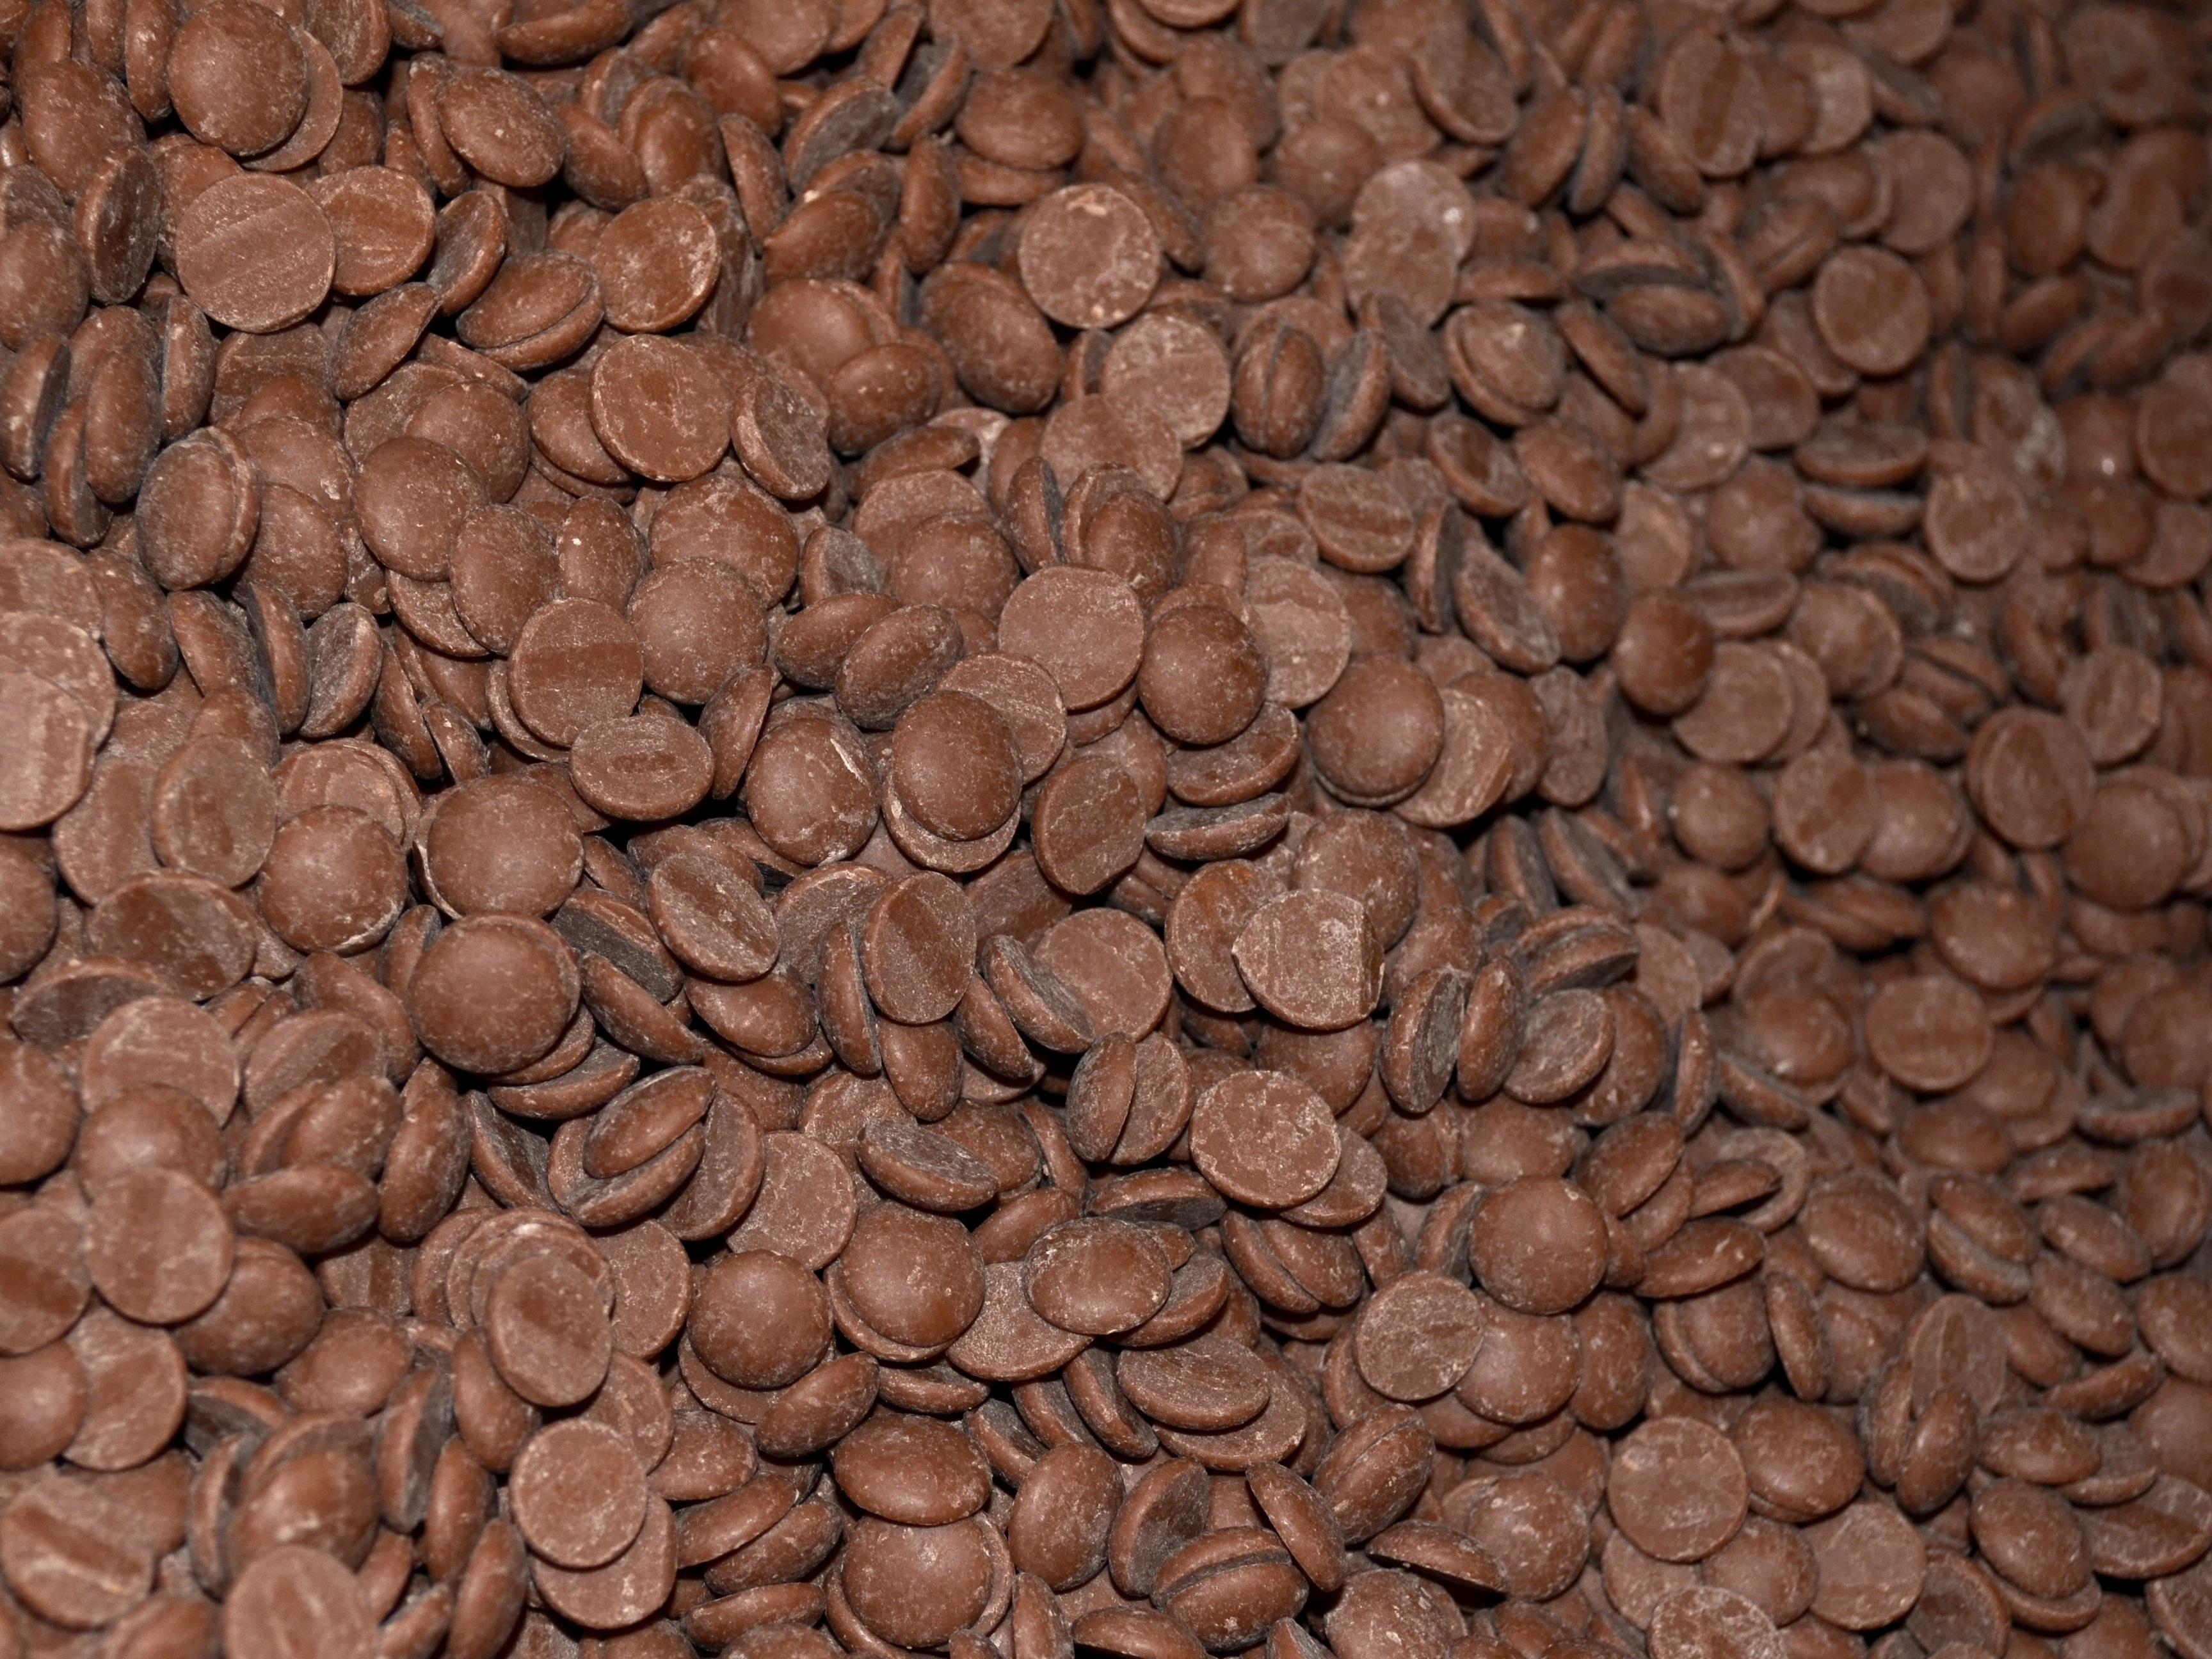 Free Images : sweet, pile, ingredient, produce, crop, brown, soil ...